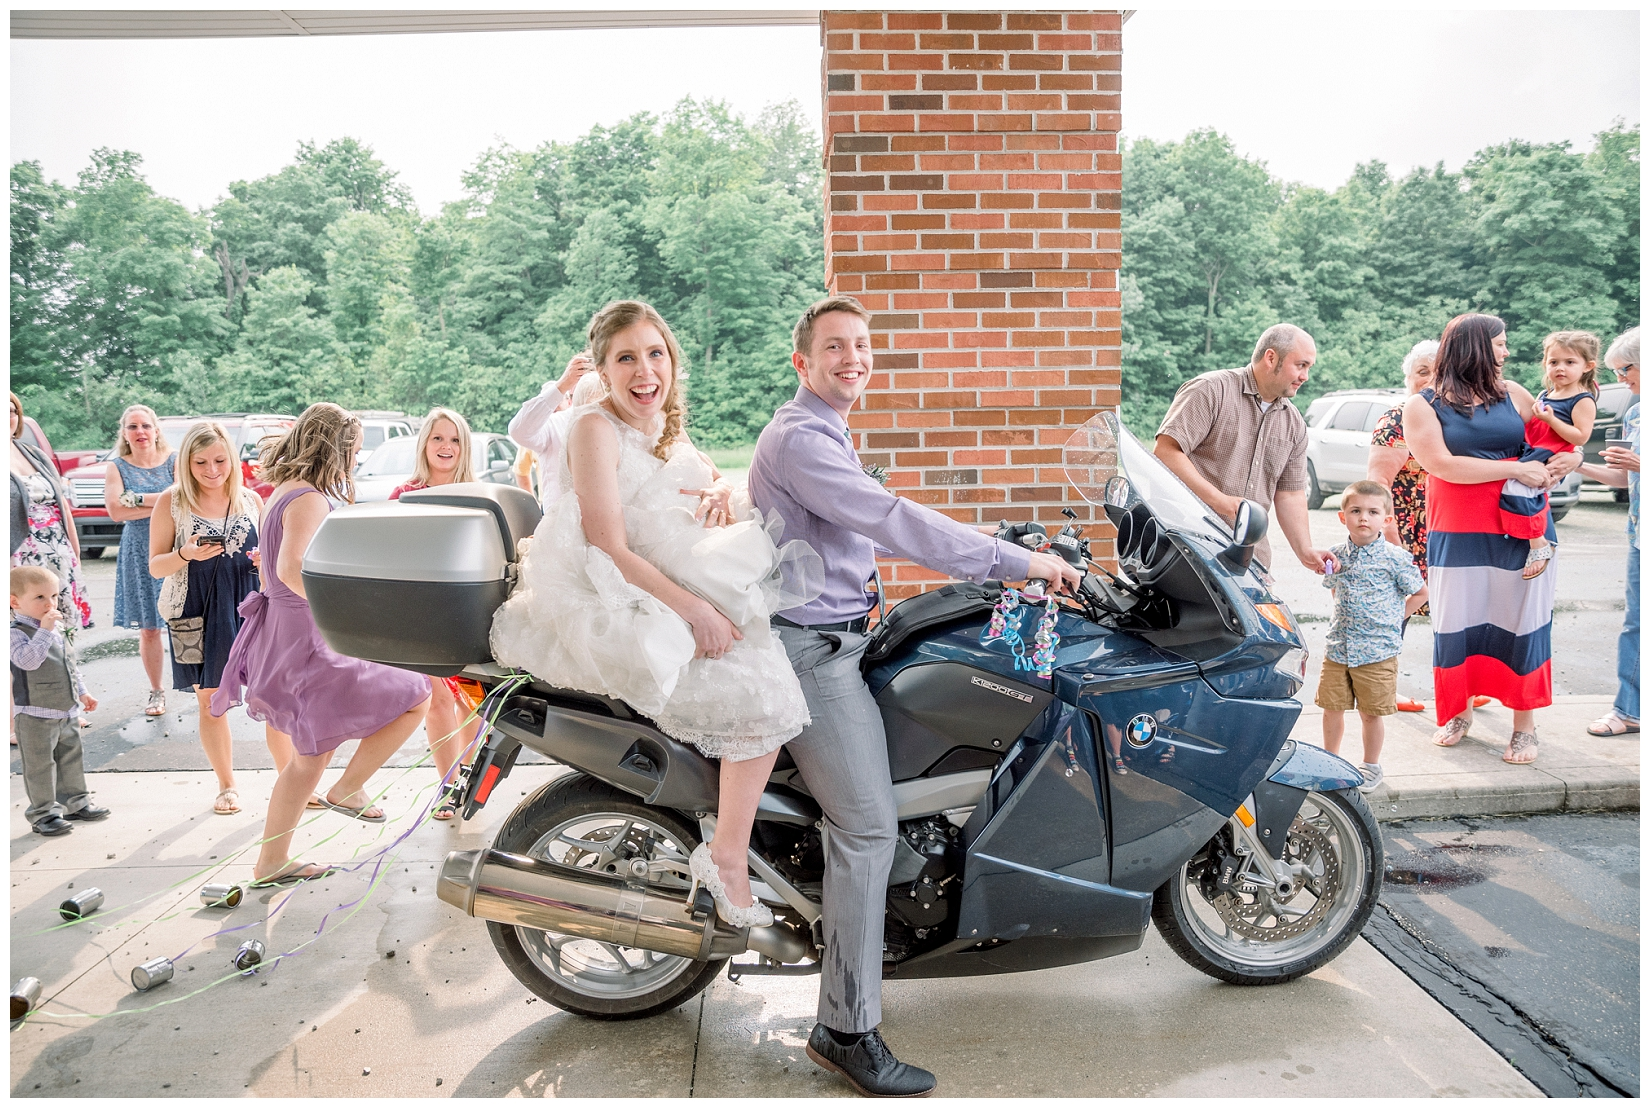 cat-alkire-wedding-photographer-indiana-chicago-indianapolis-fort-wayne_1331.jpg